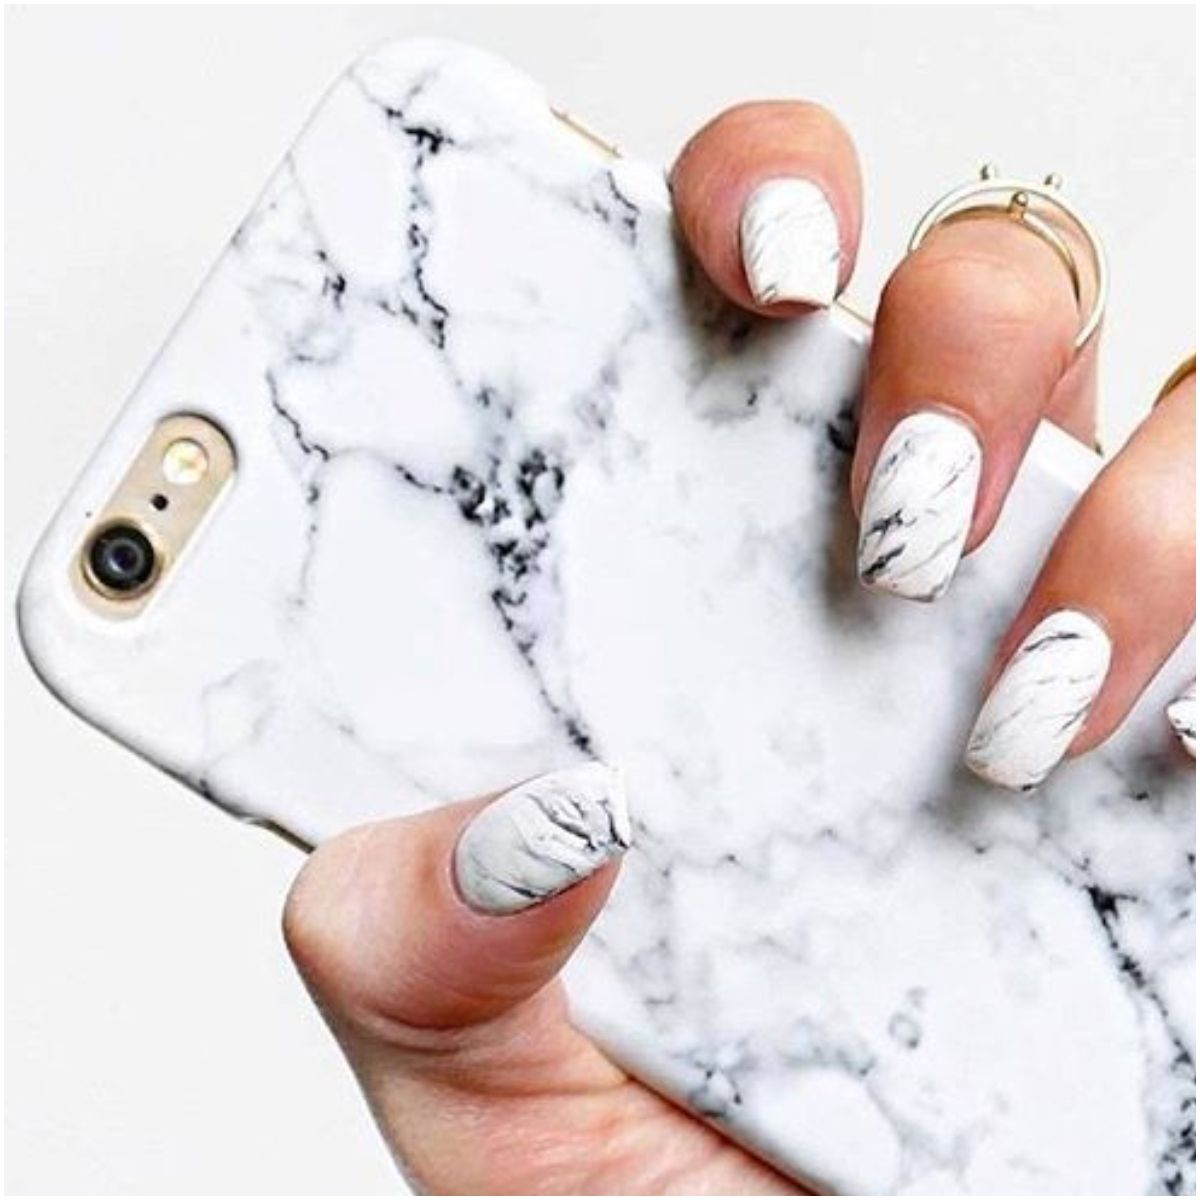 Happy Plugs, 大理石紋, 手機殼, 手機殼推薦, iphone s, iphone xs, iphone max, 科技, 蘋果, ELLE Shop, 手機周邊, 配件, 保護套